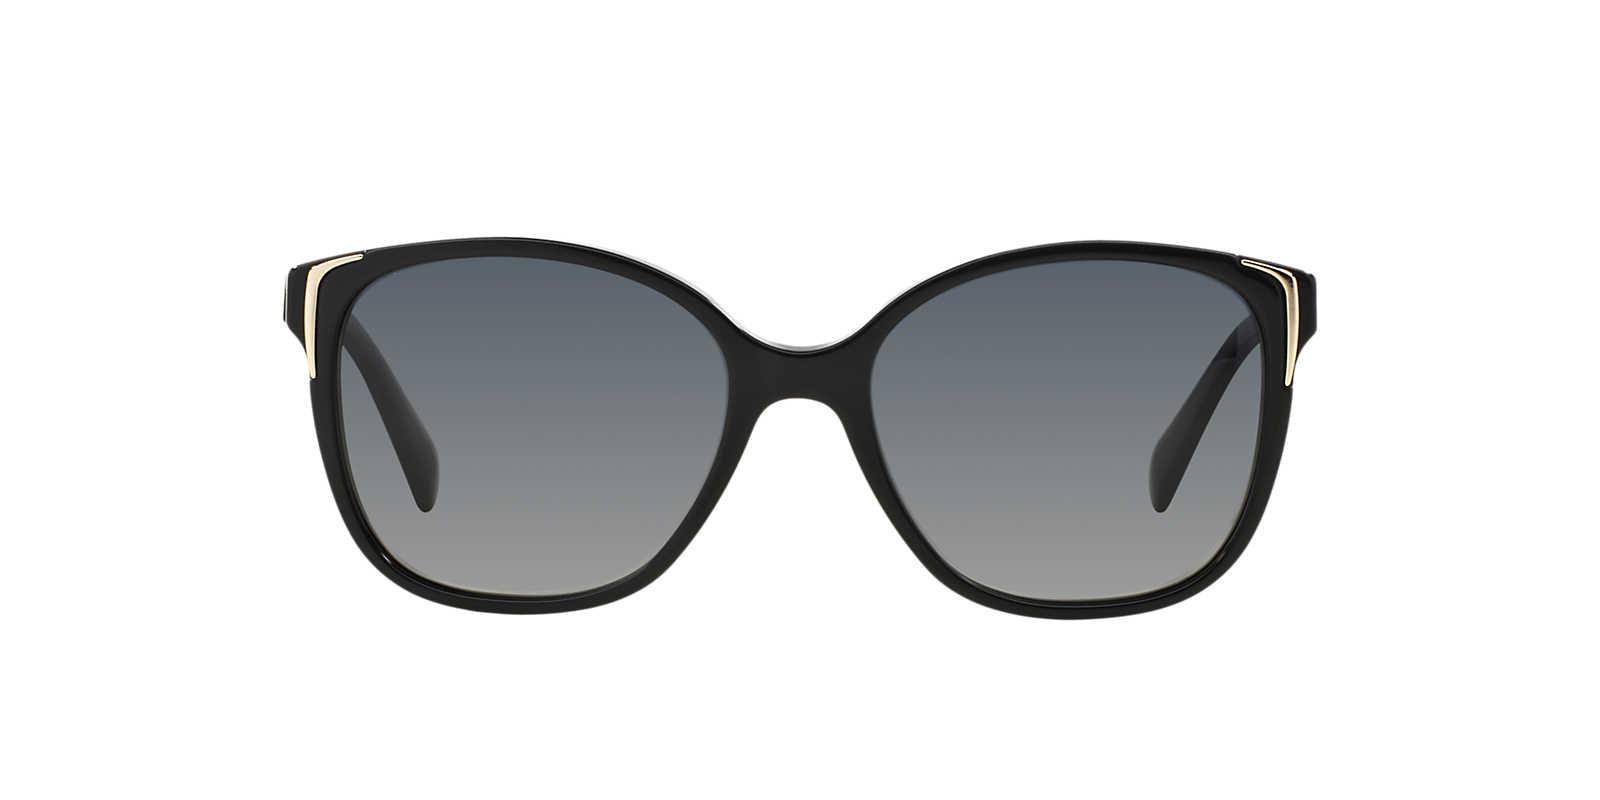 f204cacb5592 Prada Linea Rossa PS 52FV Eyeglasses Free Shipping - FS MAG